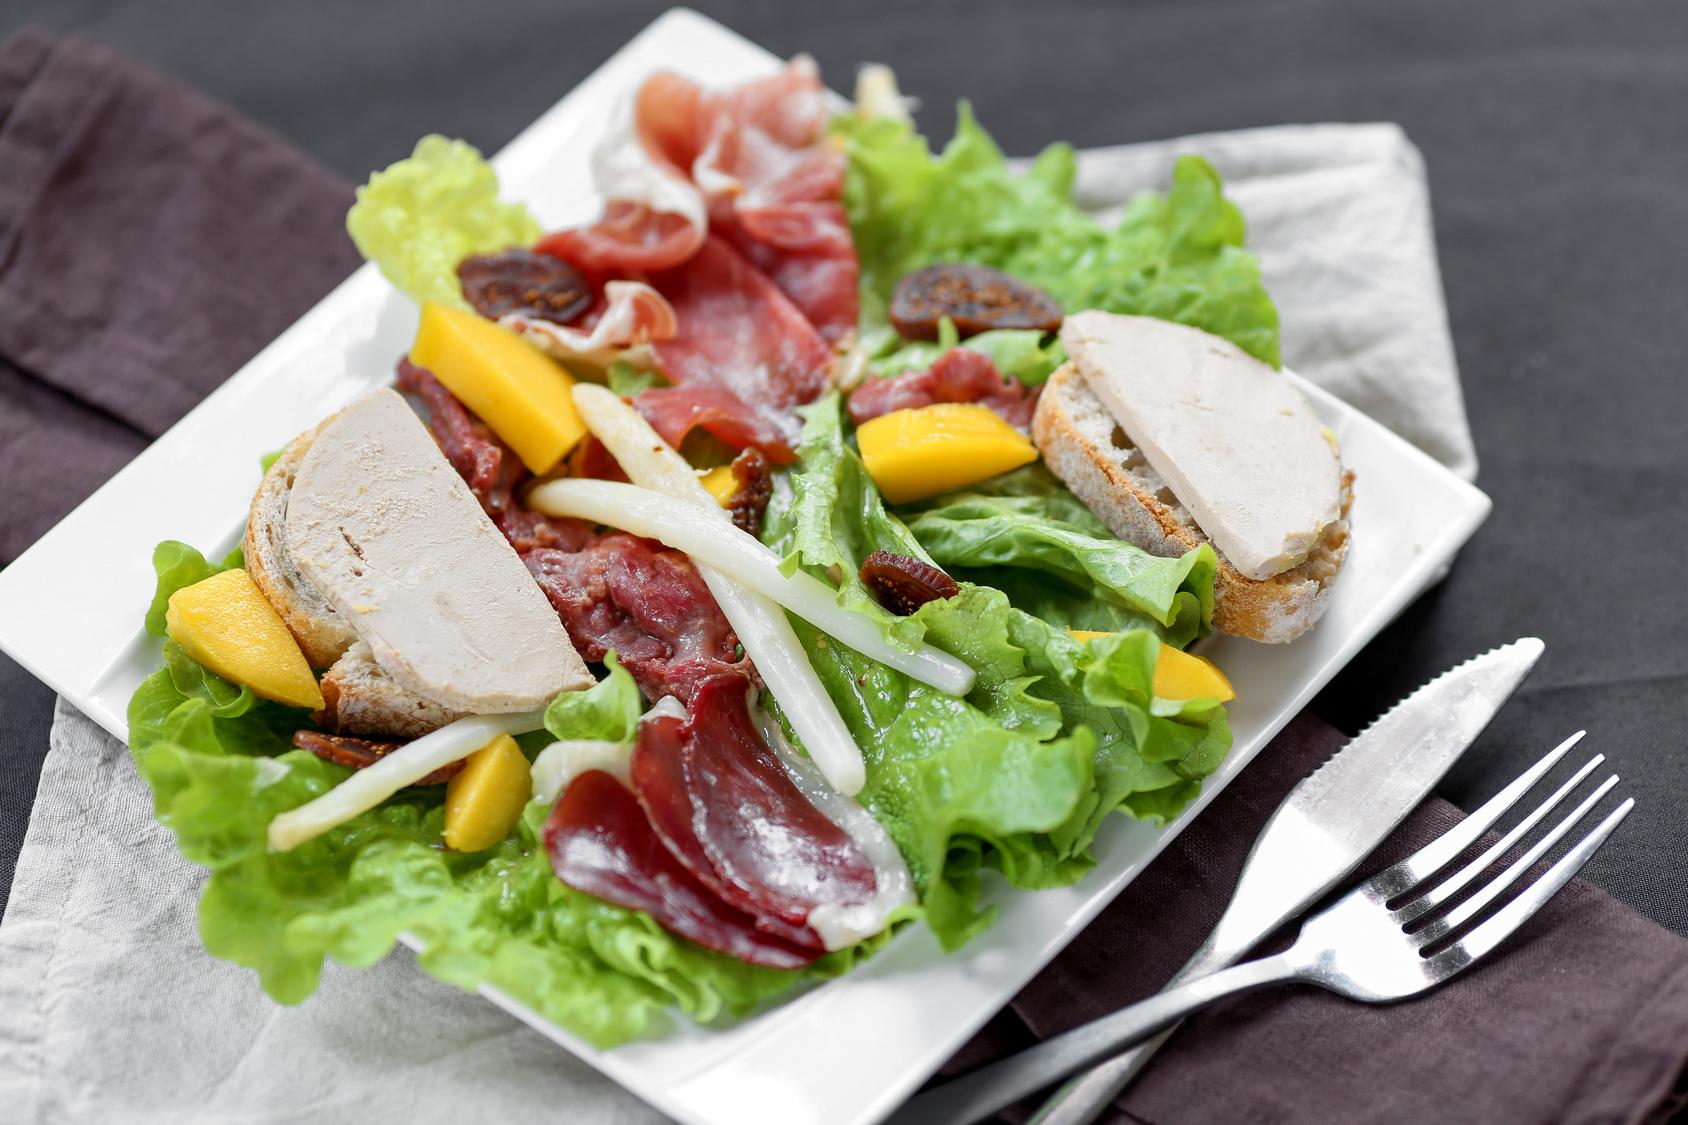 salade landaise revisite 4